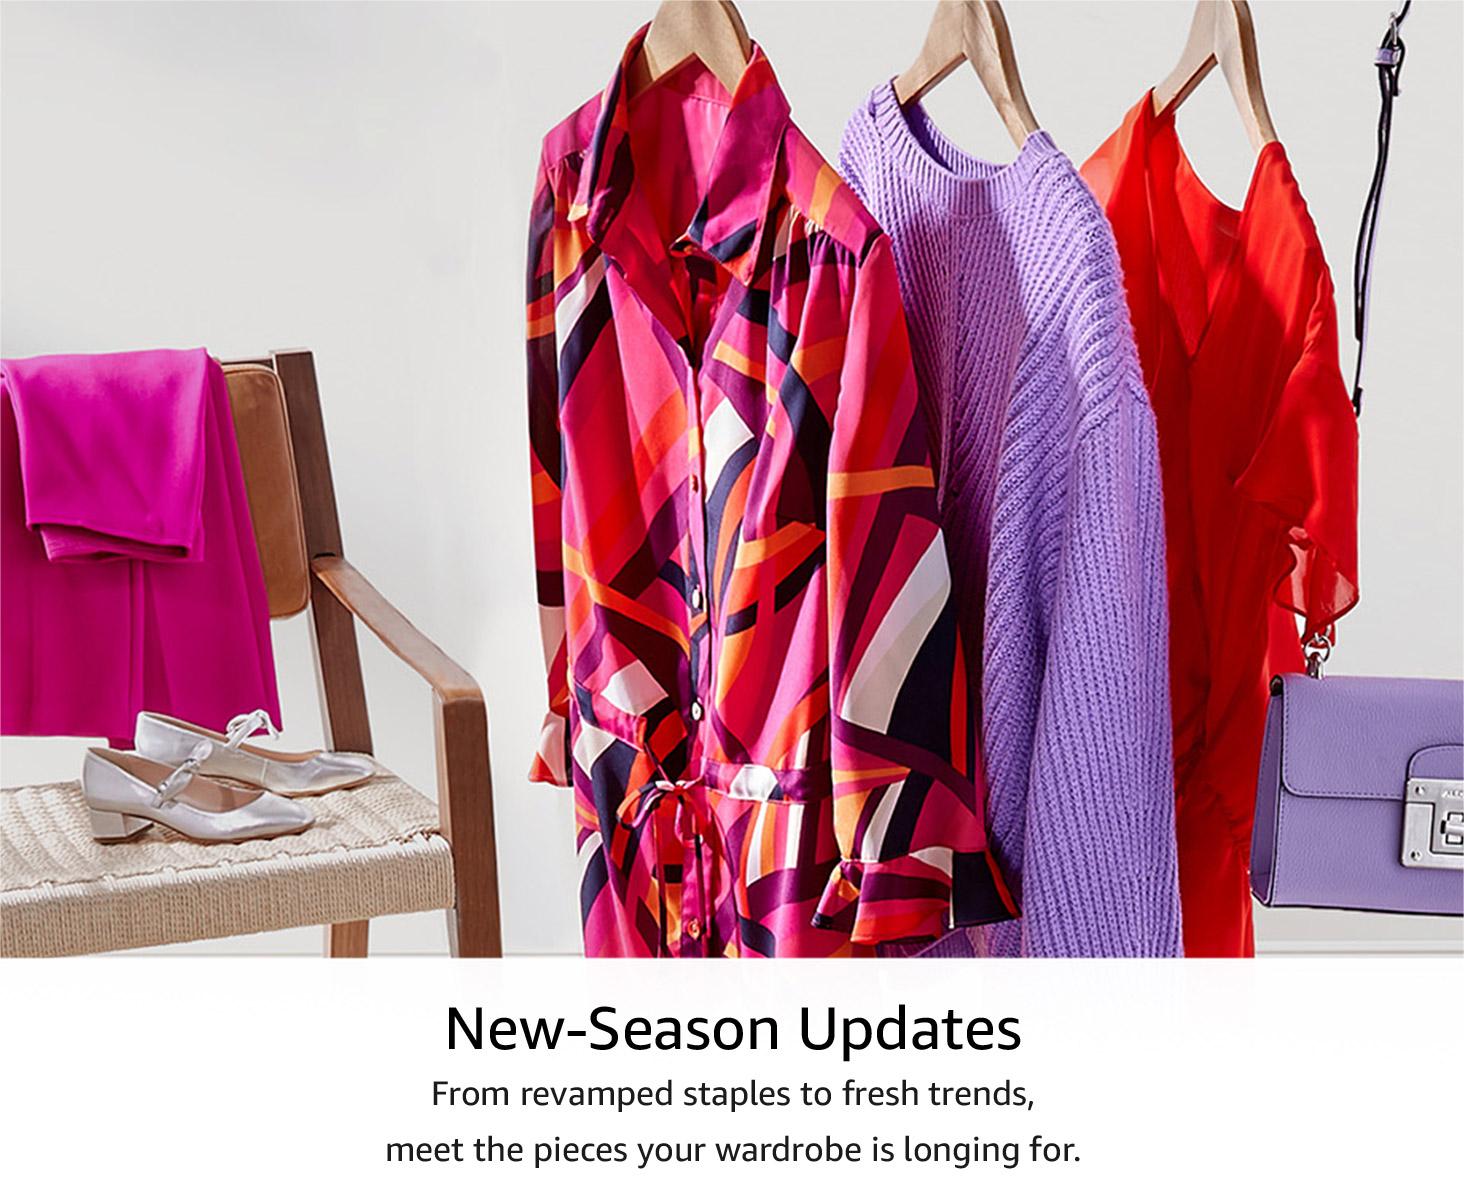 New Season Updates